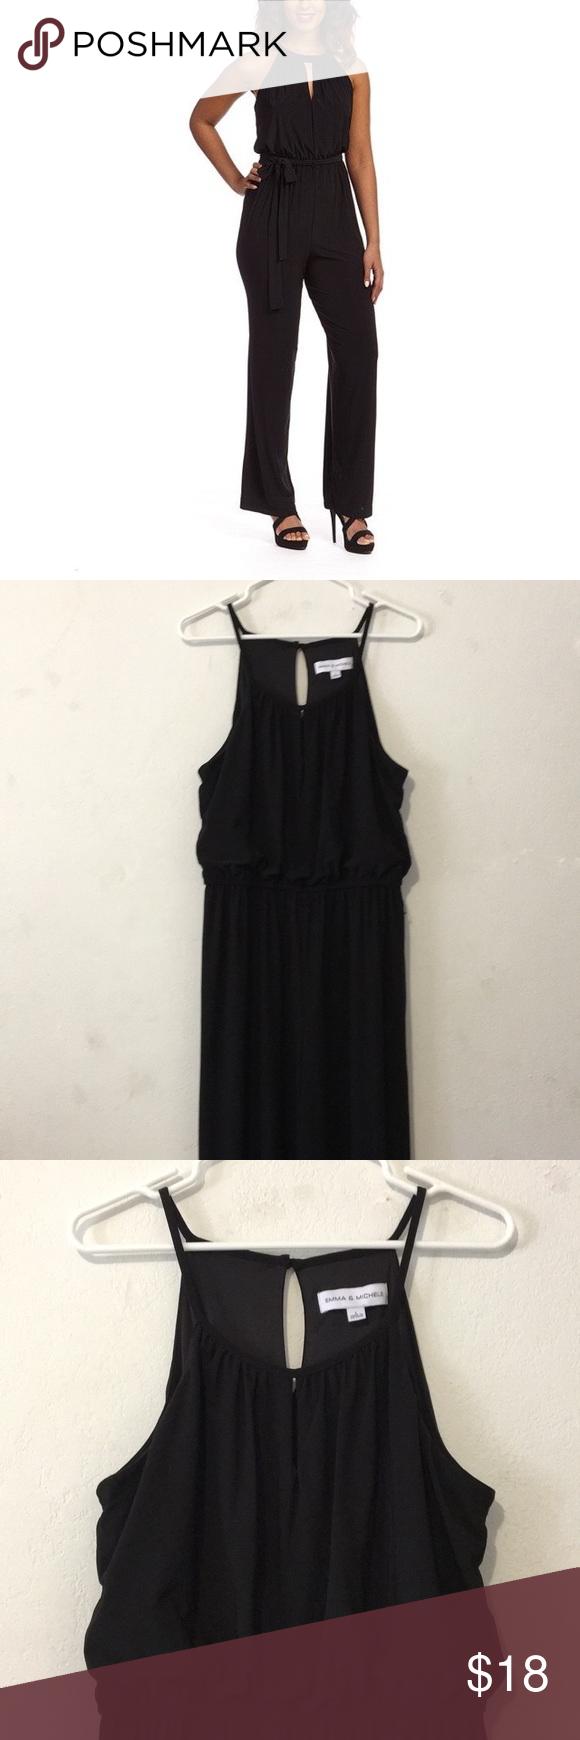 84fbc38b4eb Emma   Michele Elegant Black Halter Jumpsuit Size Large - Missing waistband  string - Otherwise in